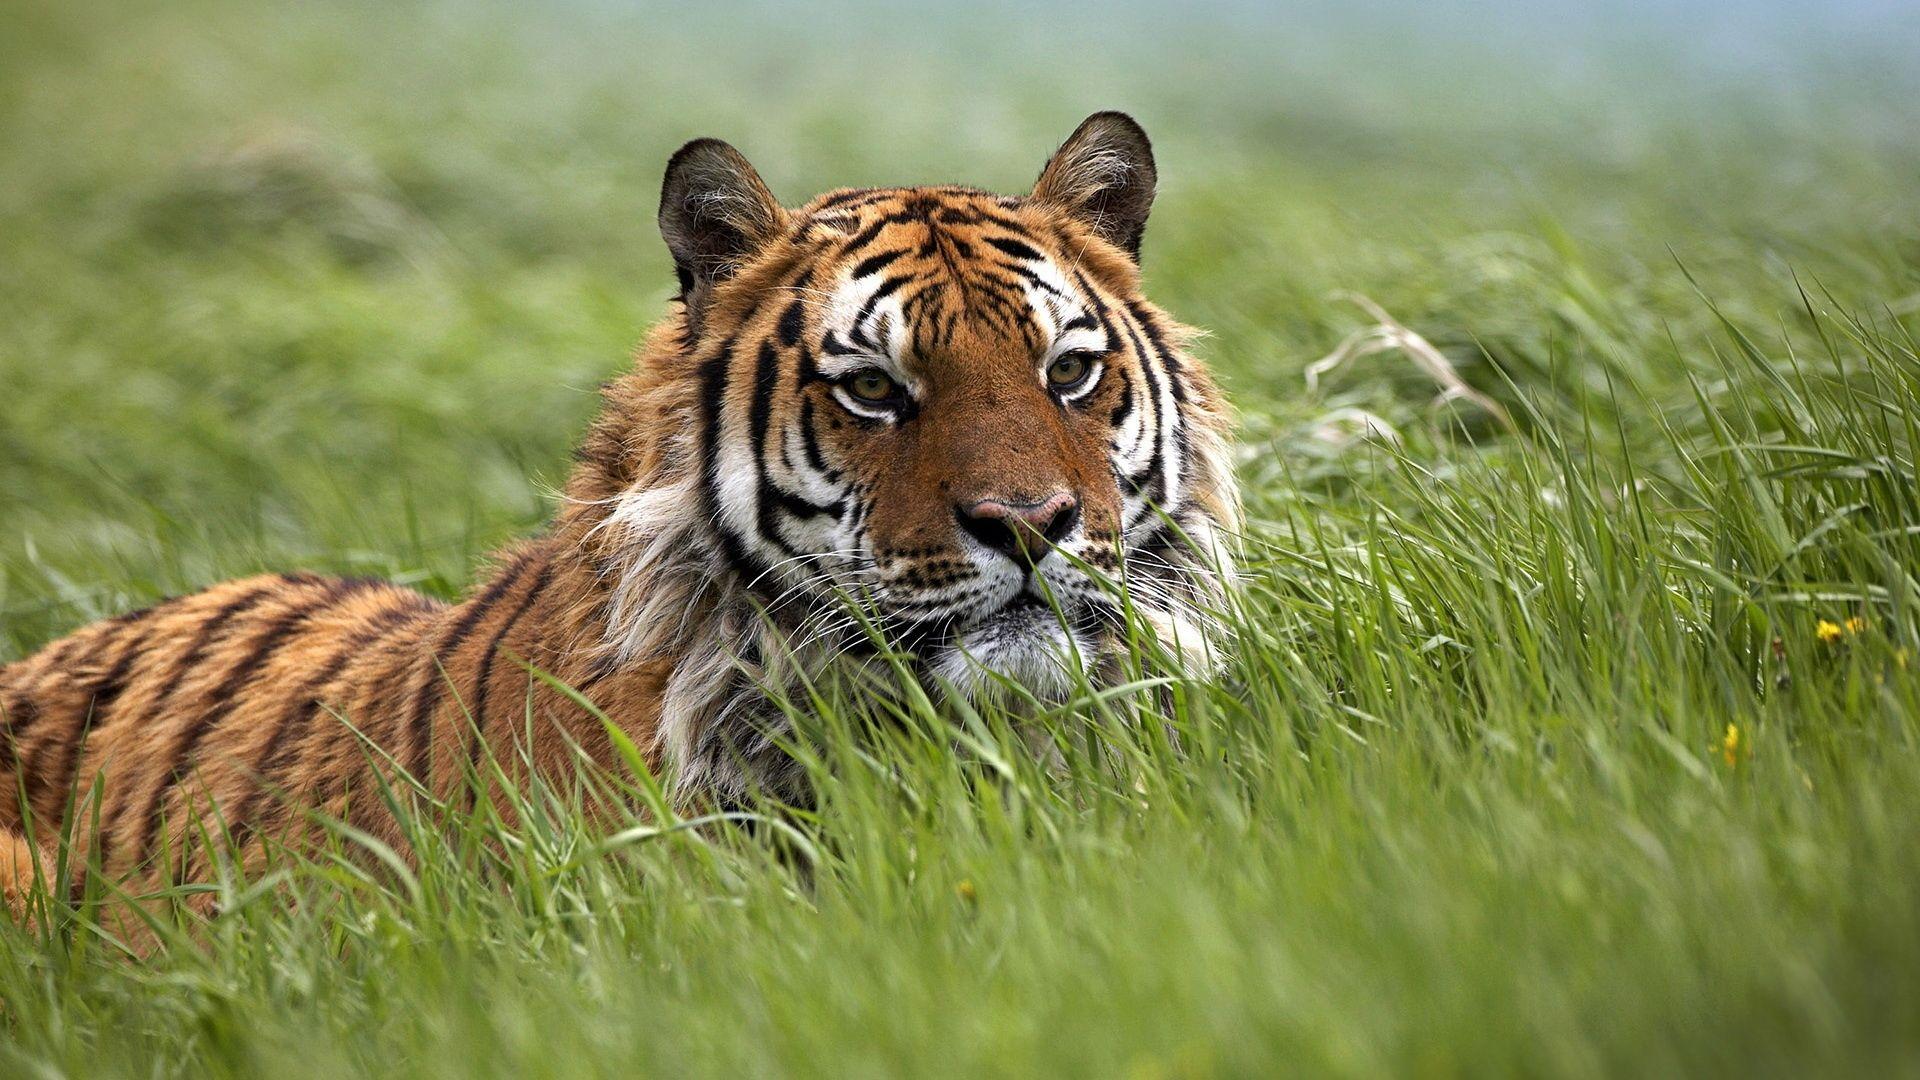 Tiger lies in the grass, Full HD Wallpaper